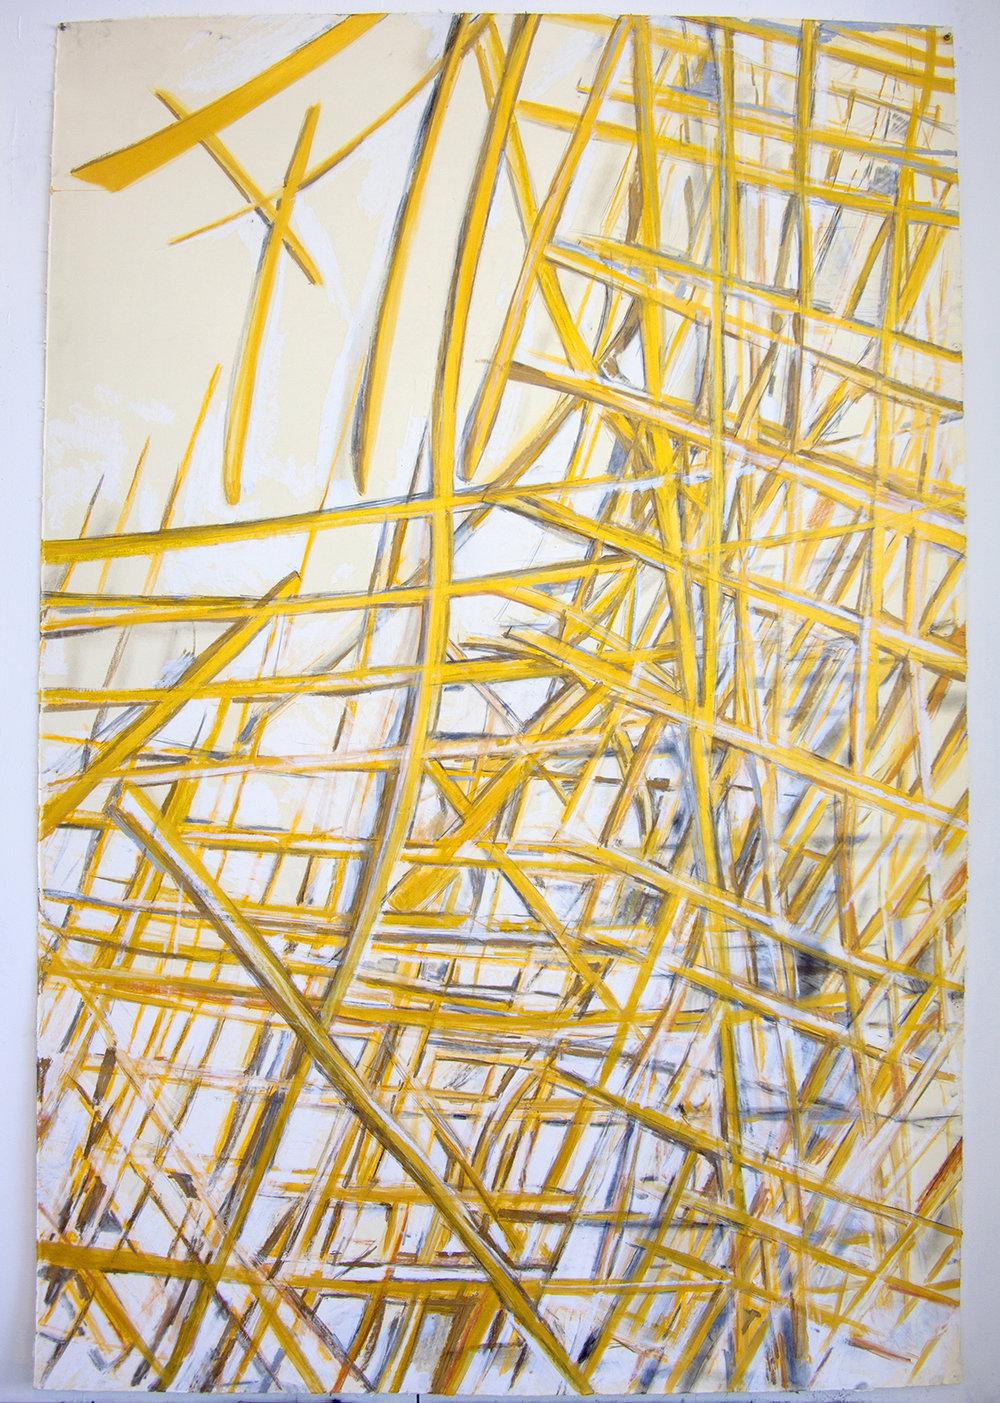 002_scaffold collapse.jpg